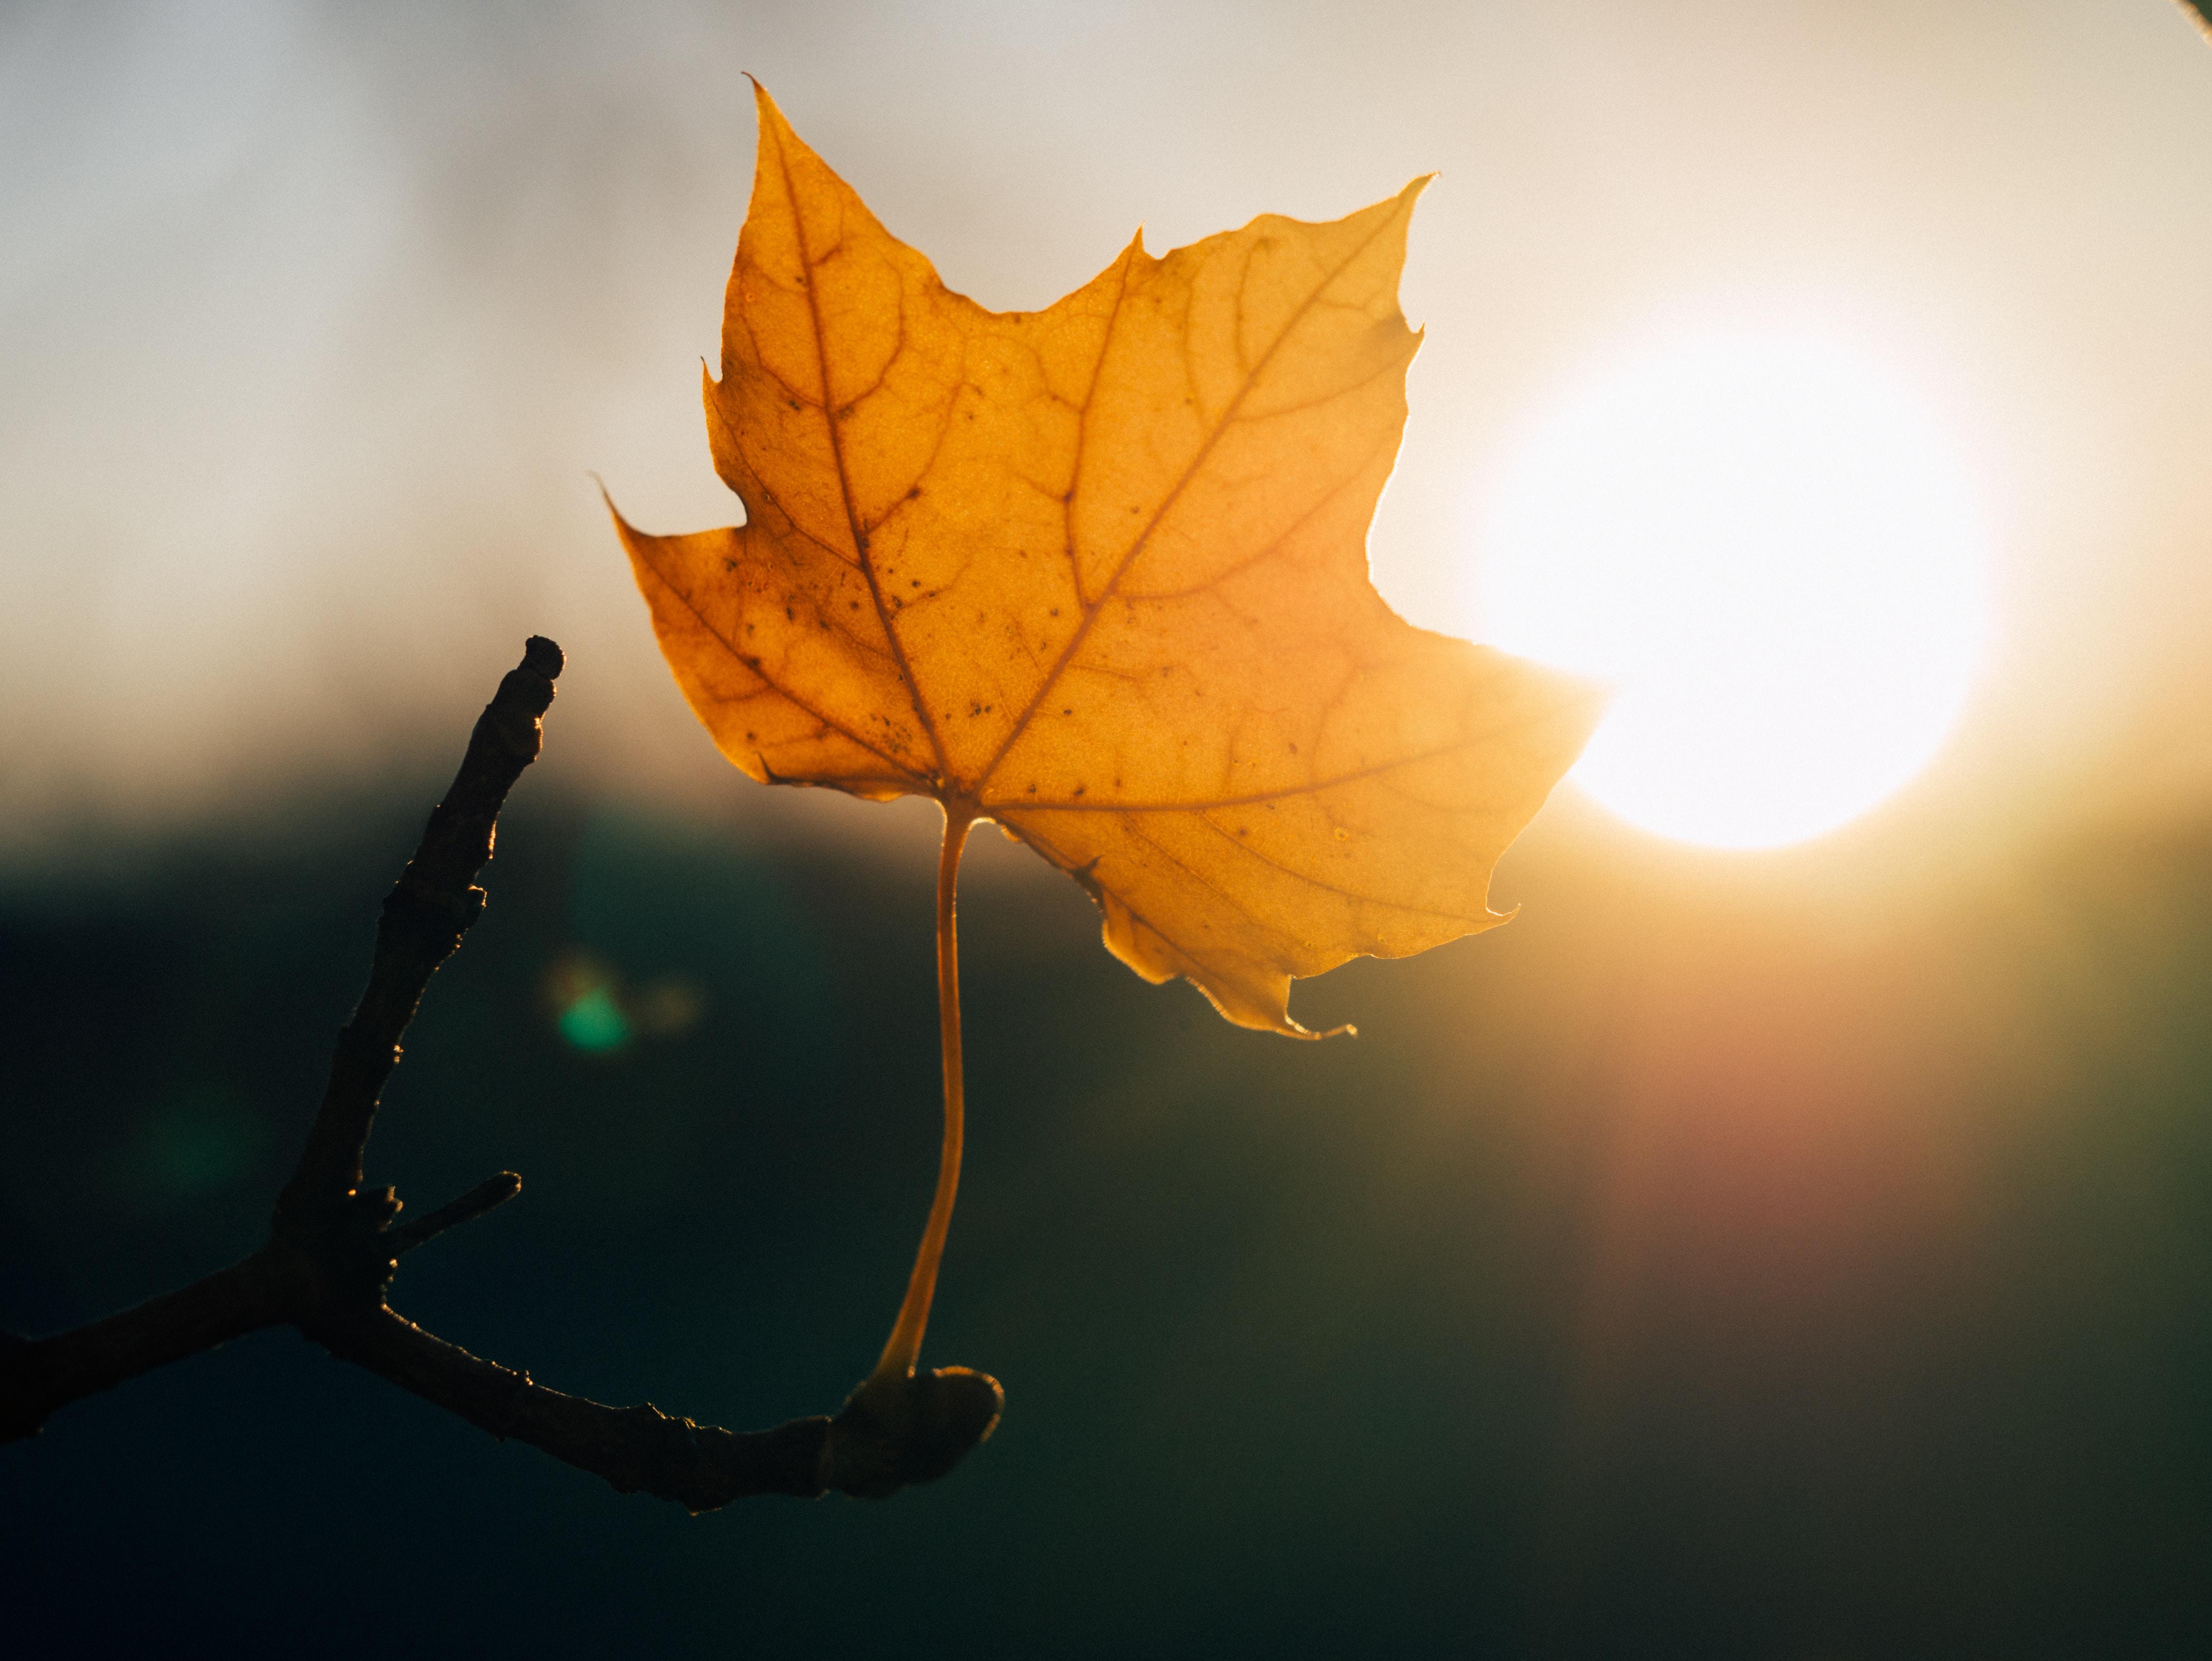 A yellow leaf blocking a sunset.